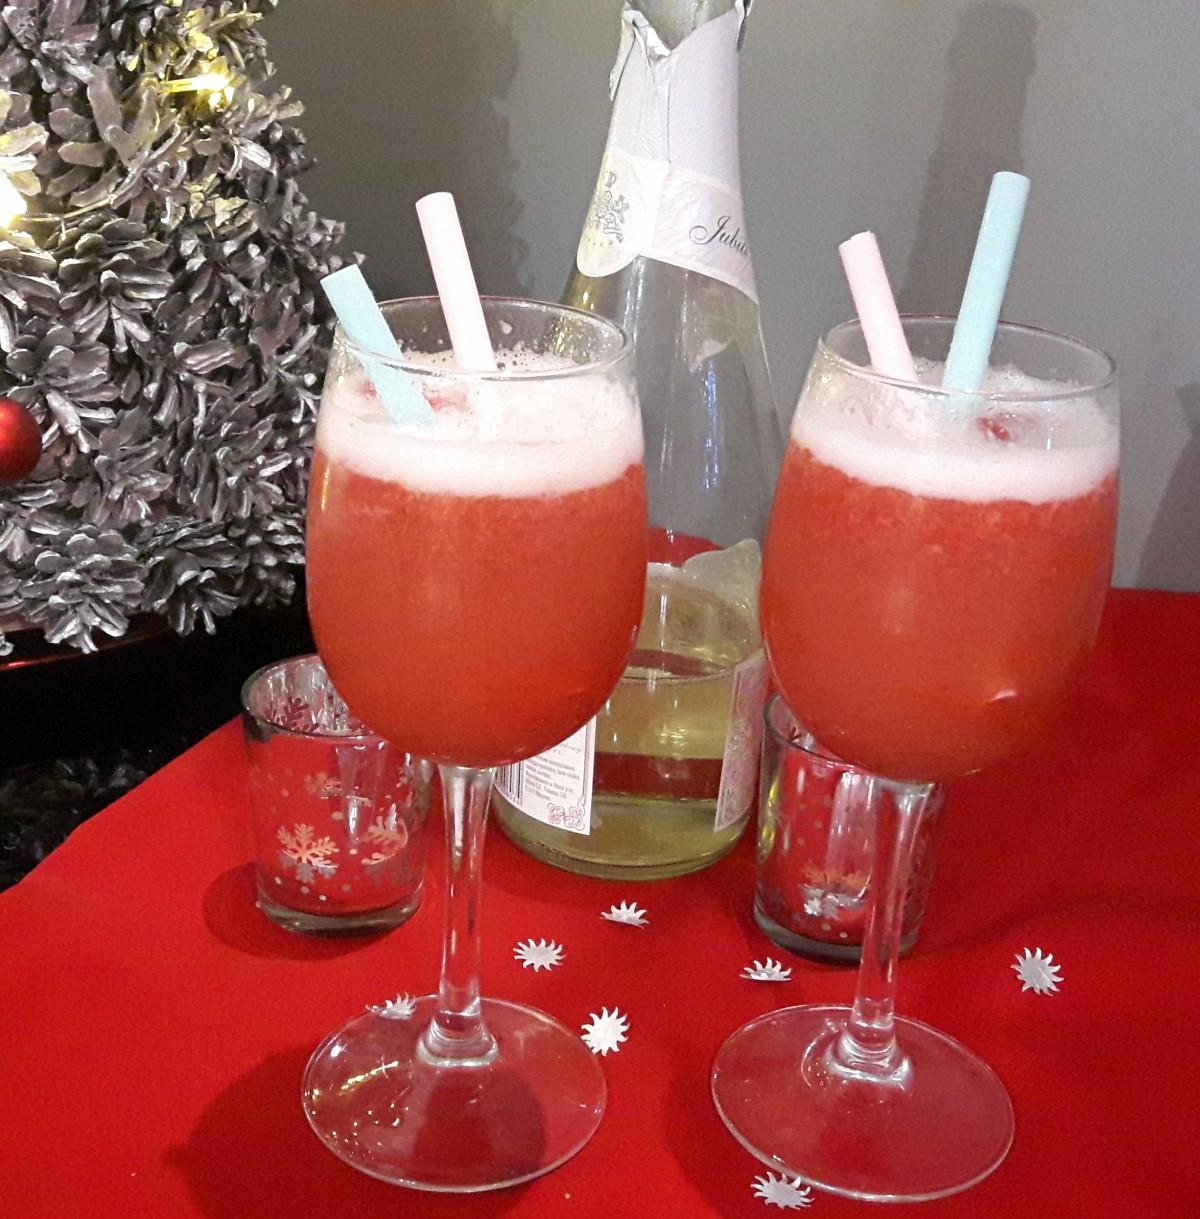 Truskawkowy szampan